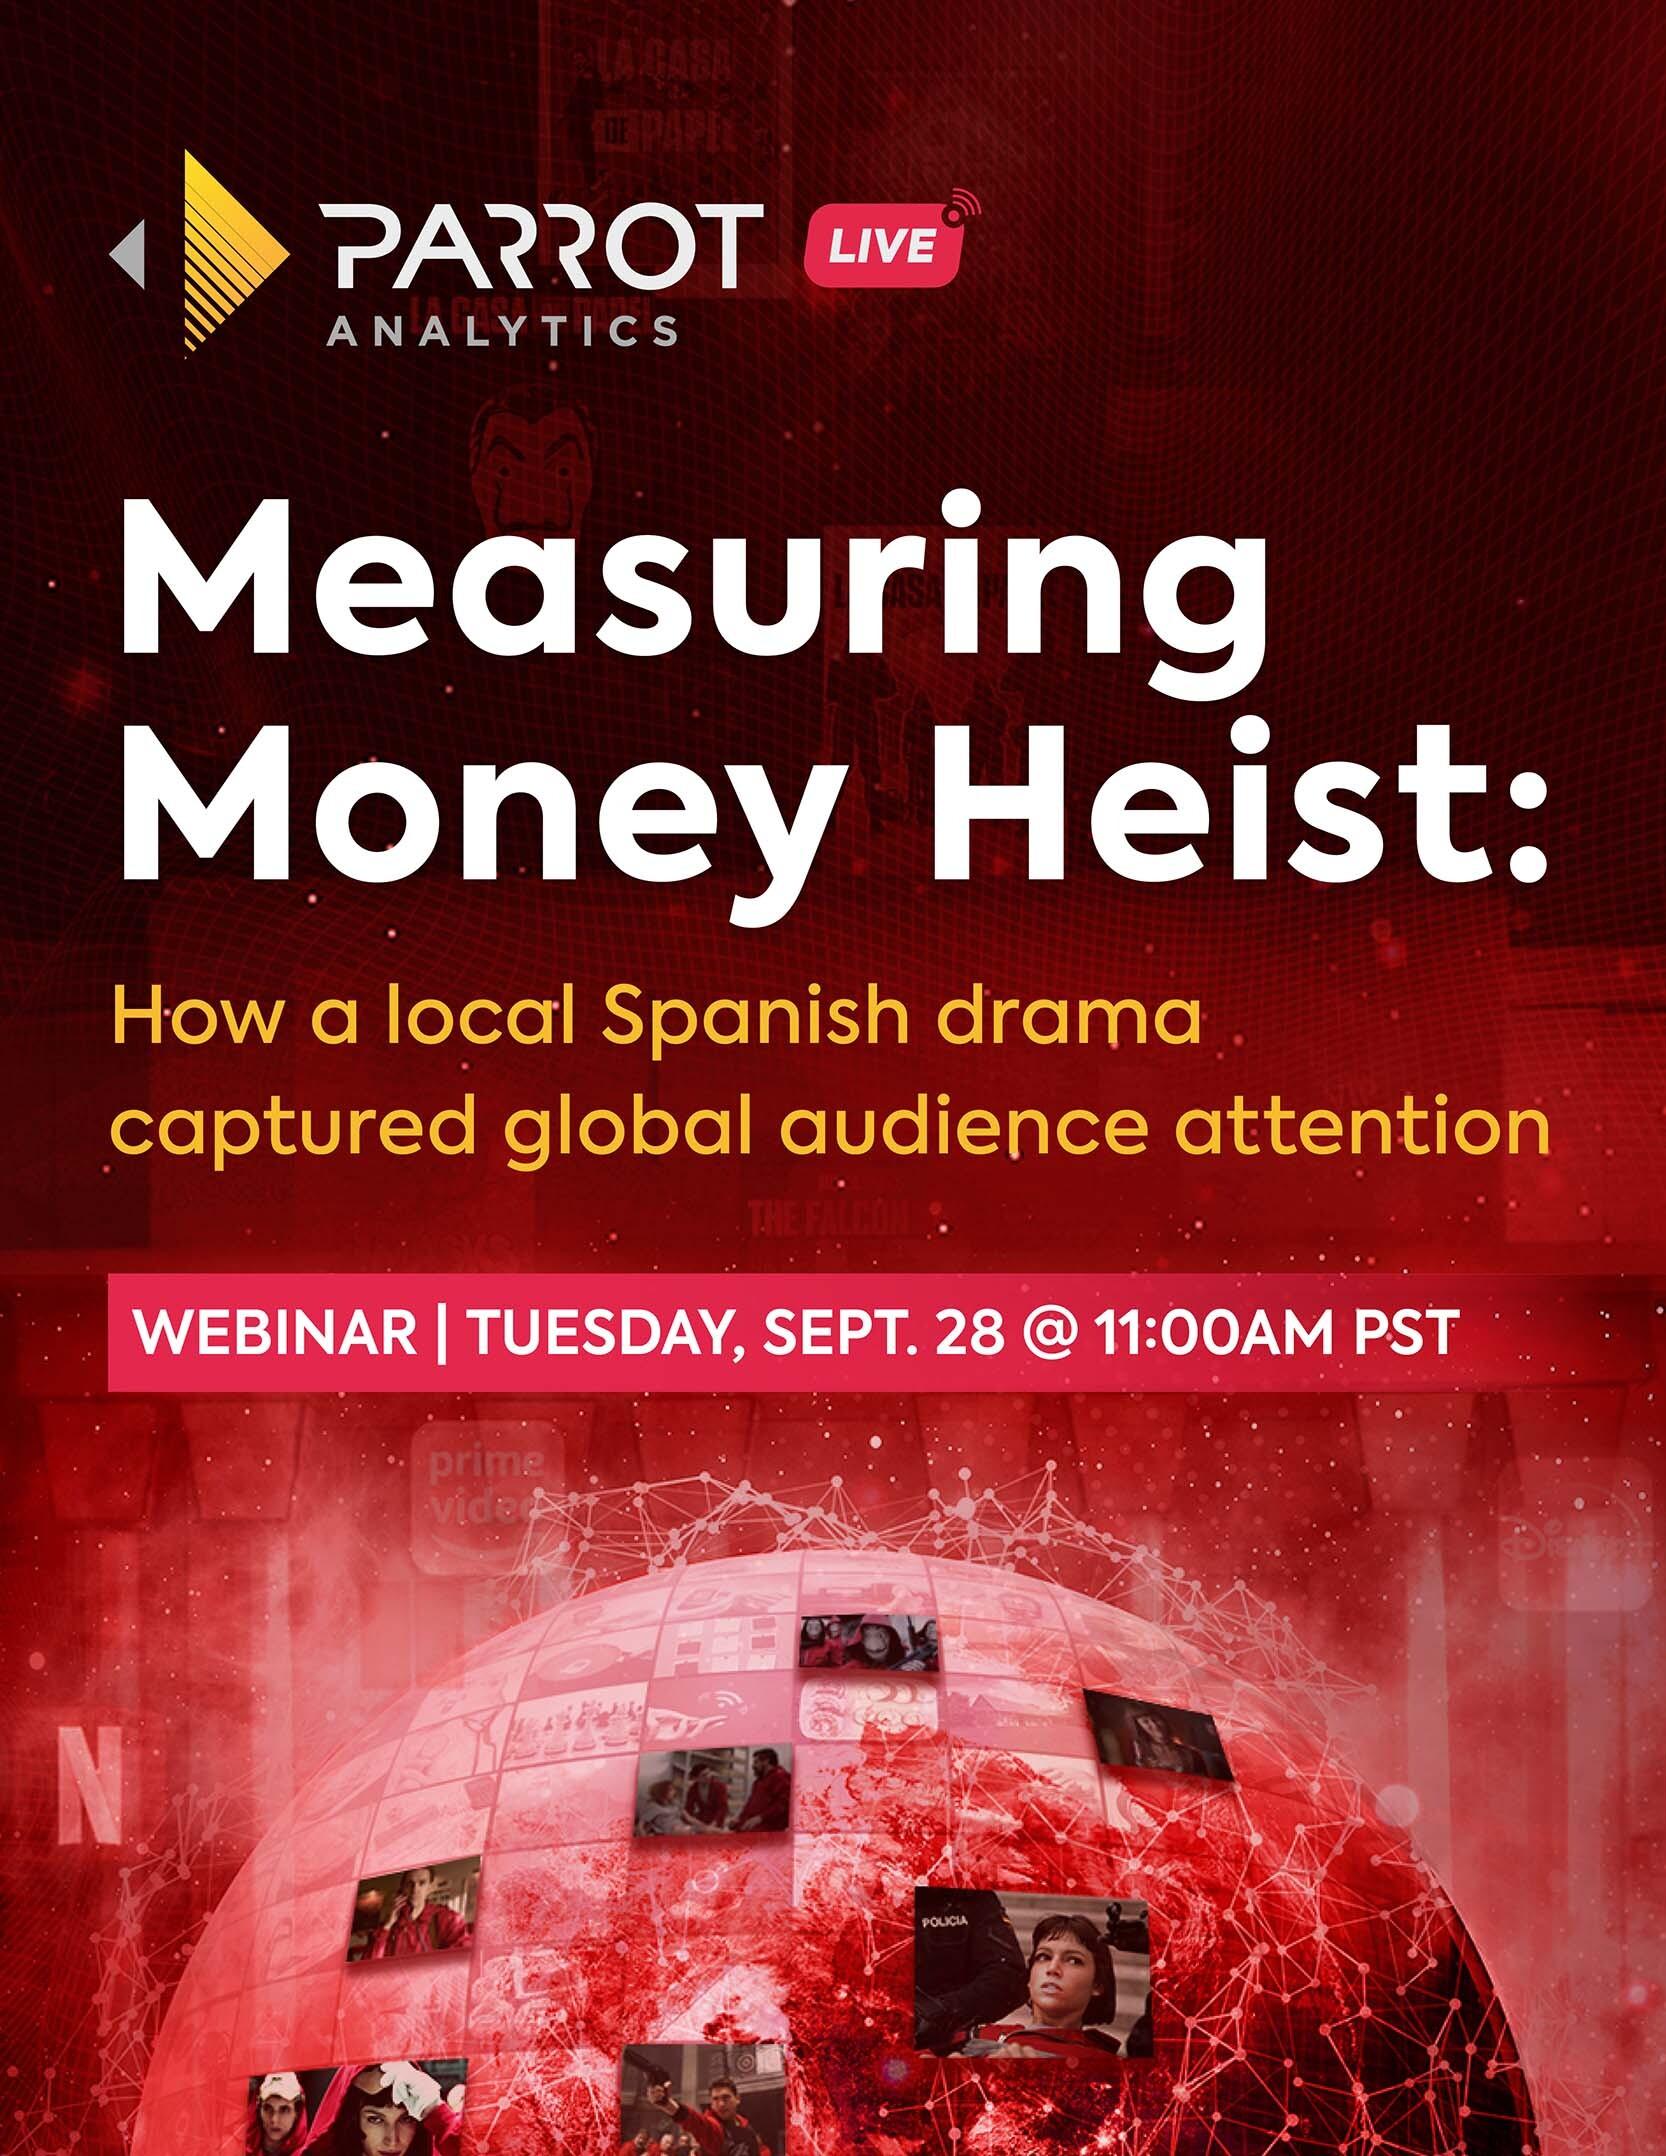 Parrot Analytics LIVE: Measuring Money Heist